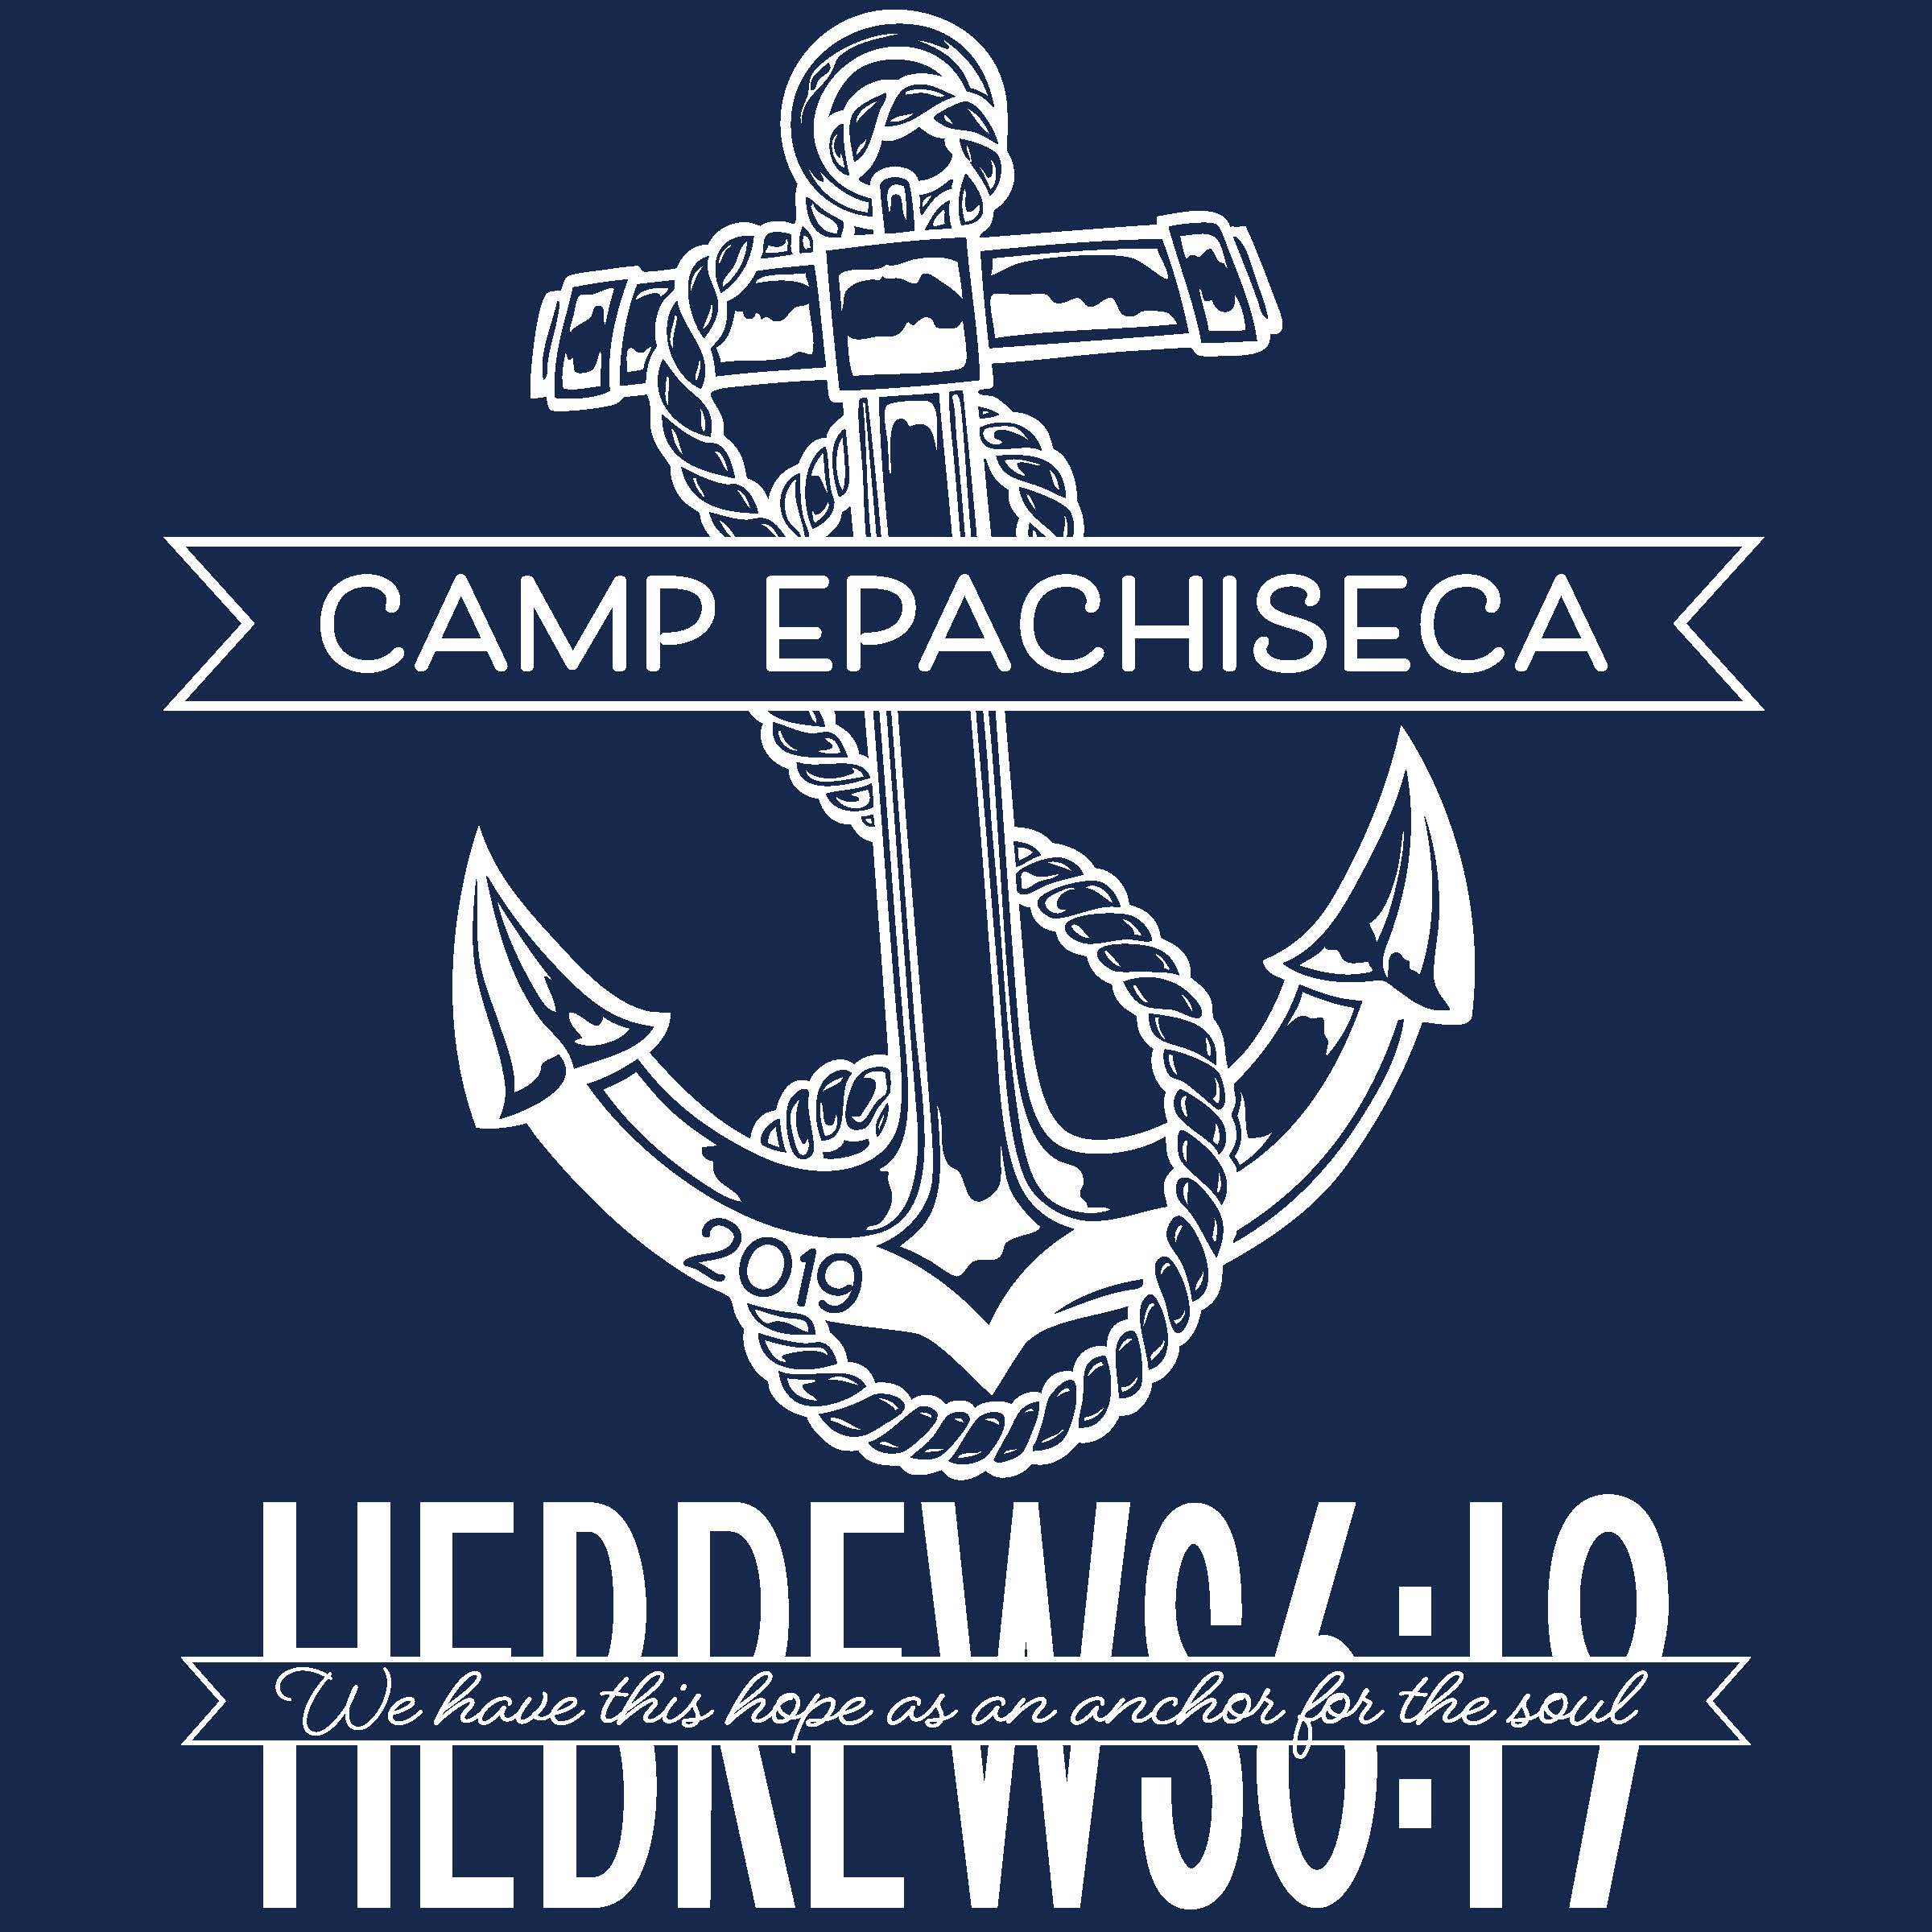 Camp Epachiseca Shirts 2019.jpg